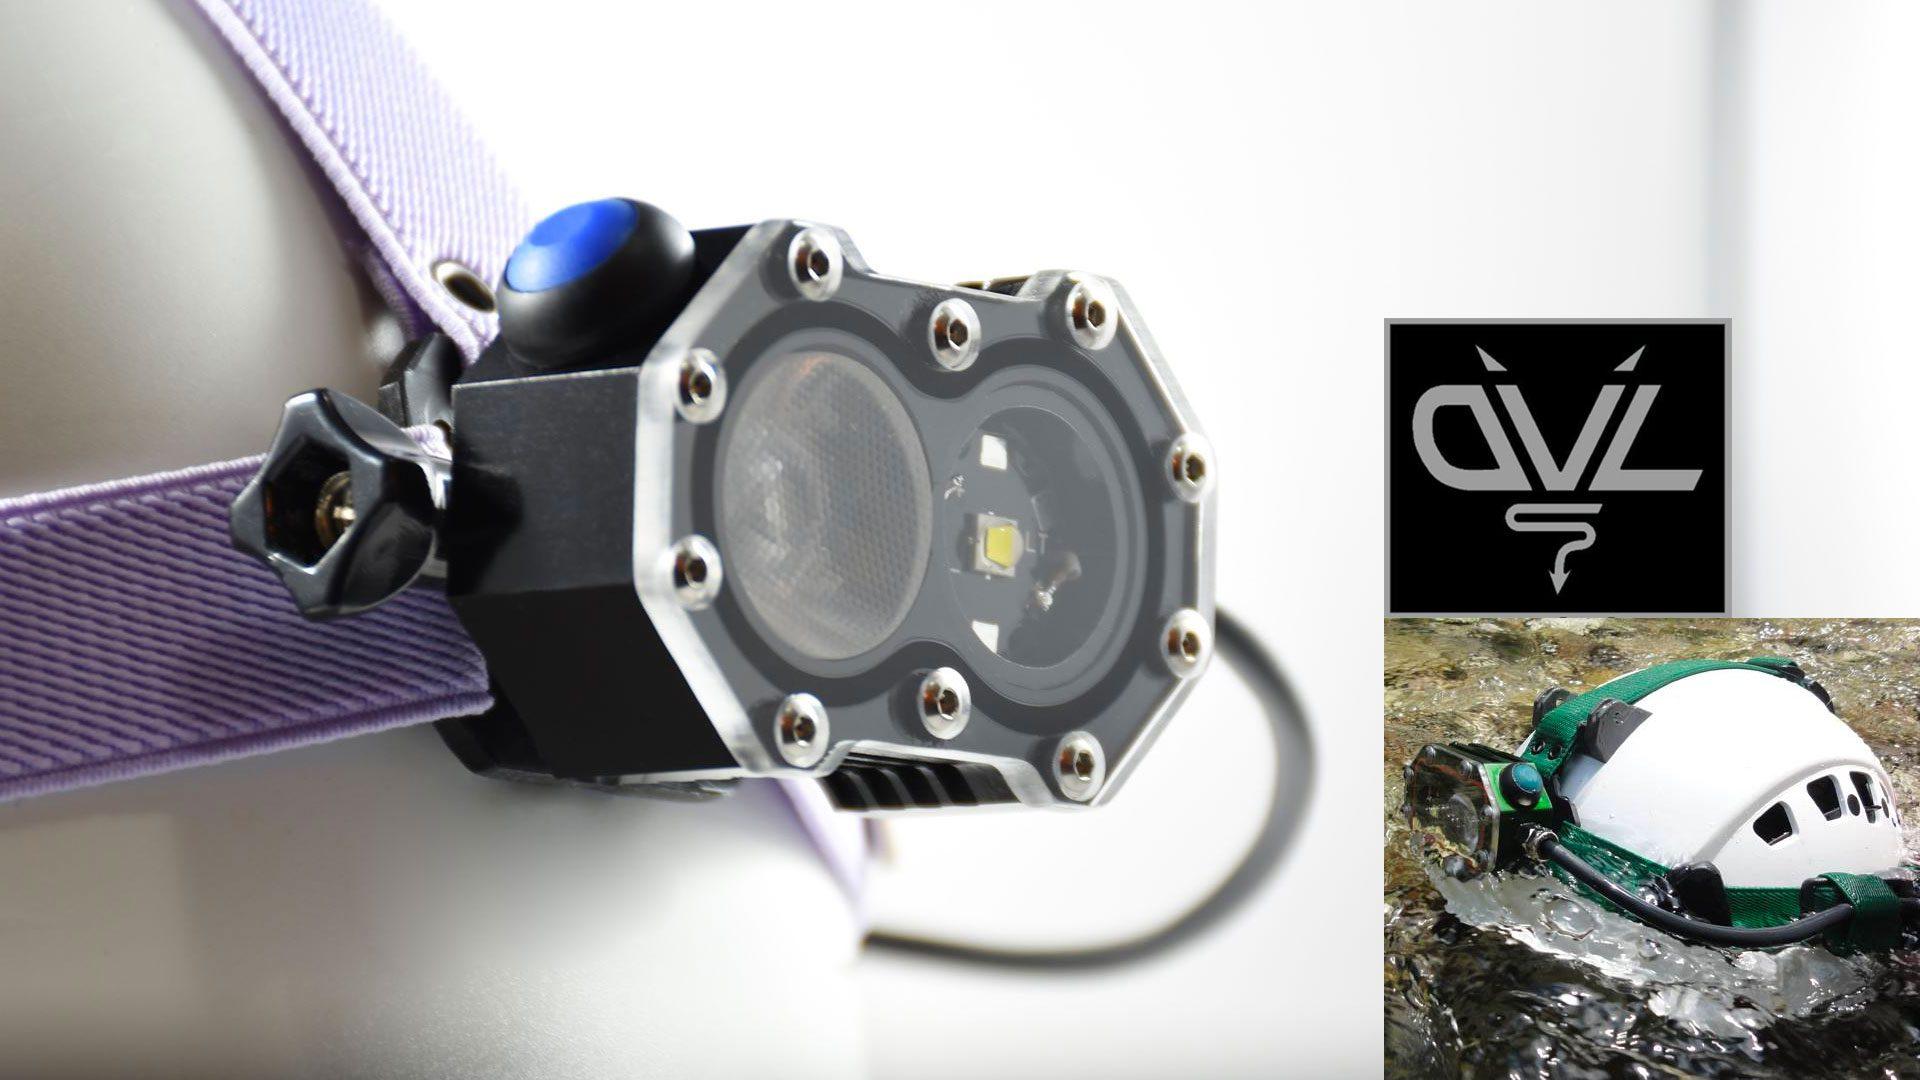 Dvls canyoning and caving headlamp